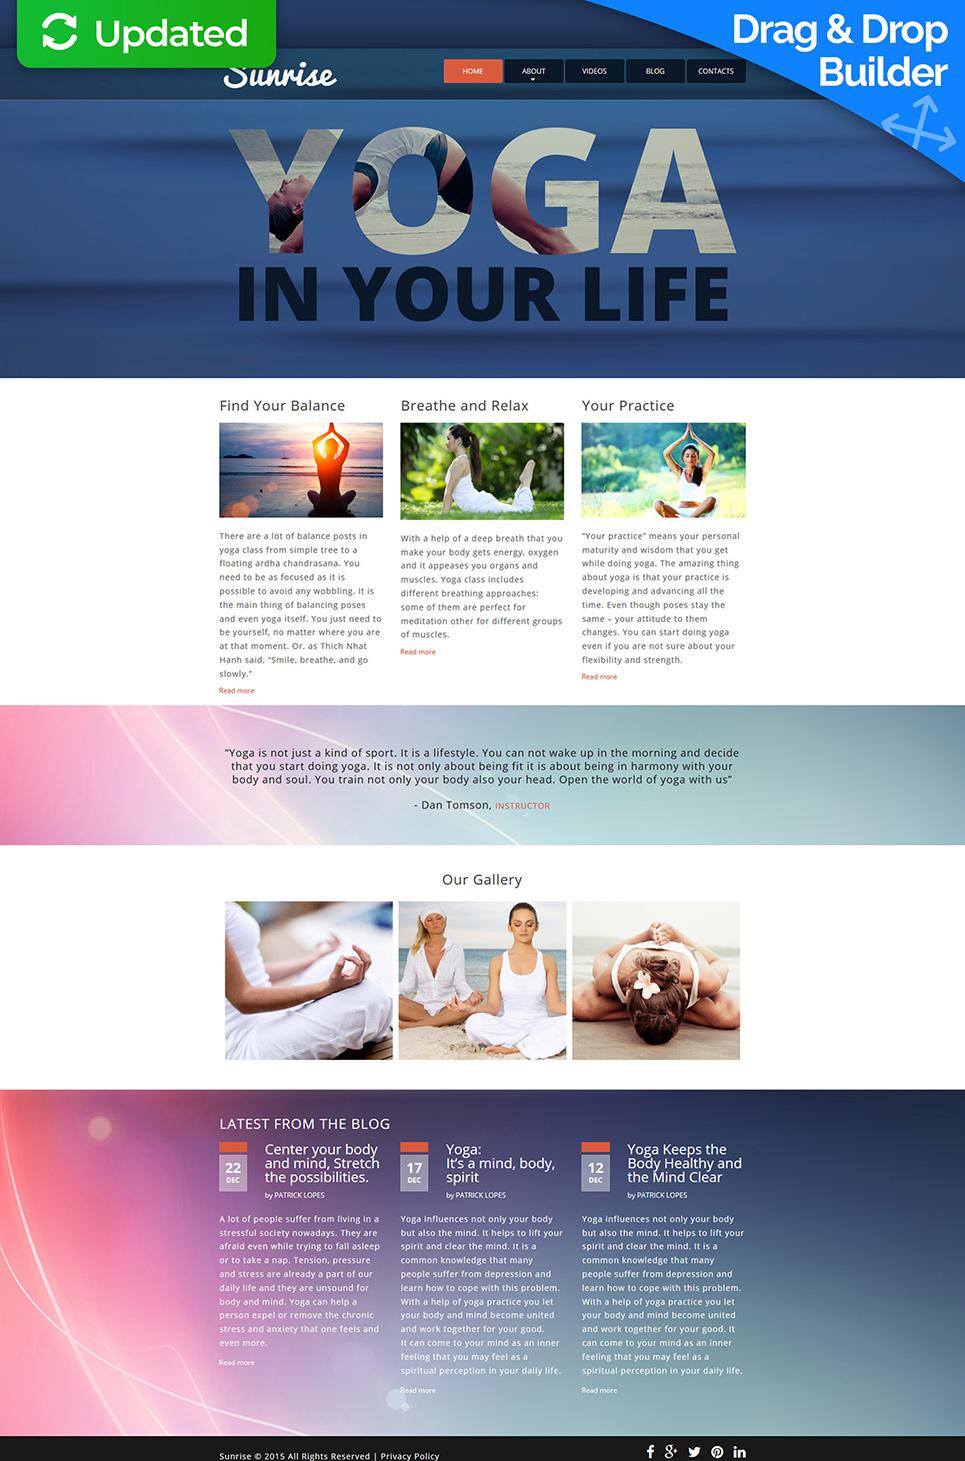 Web design for yoga club site